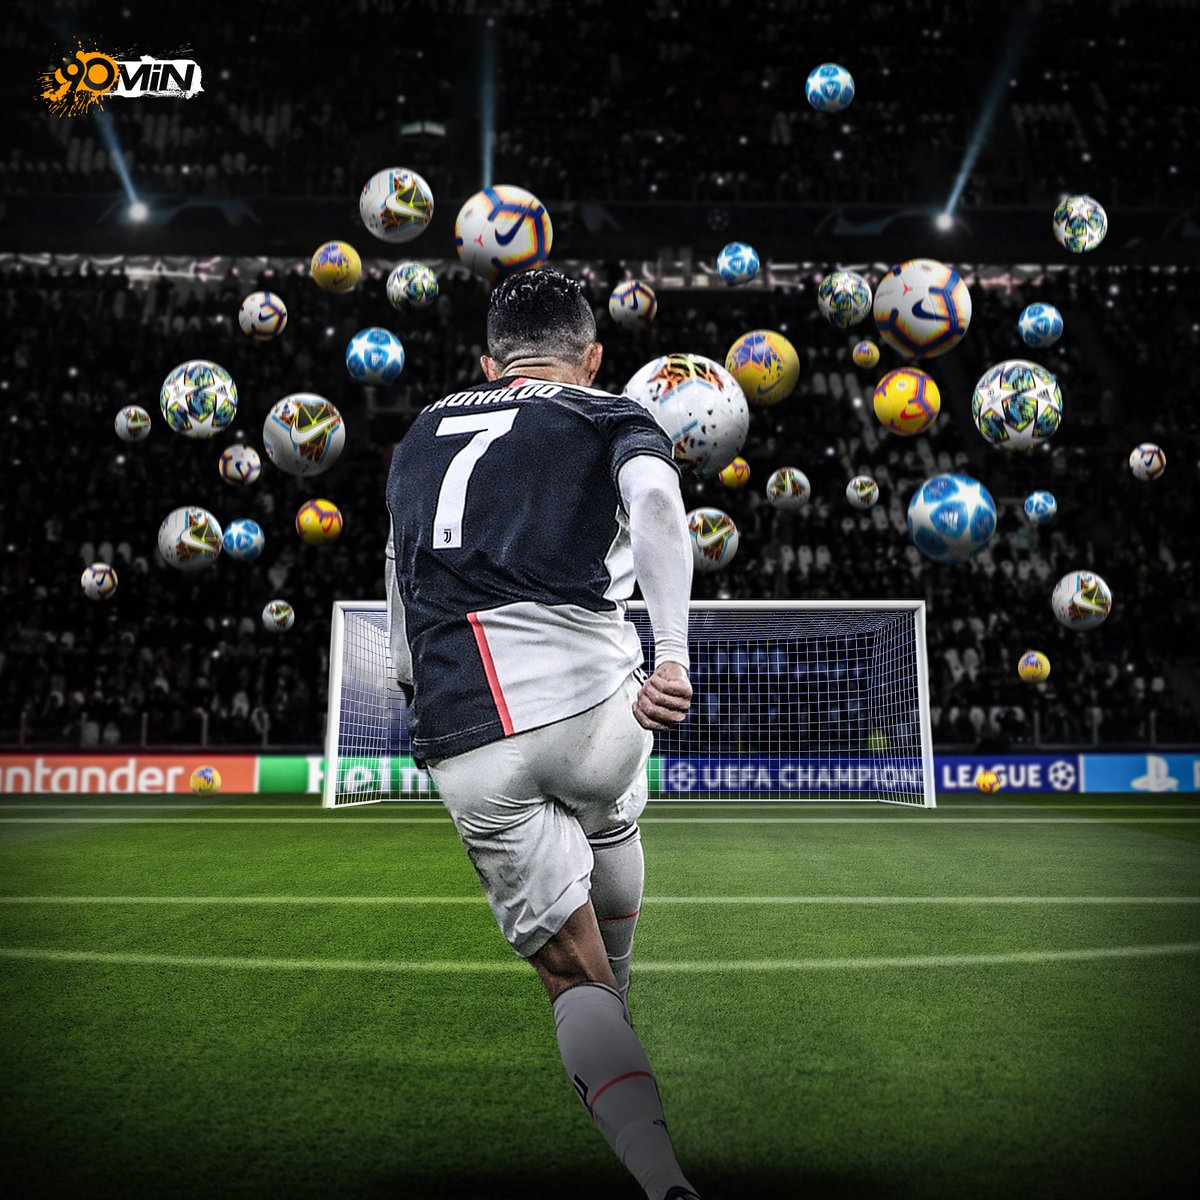 RT @90min_Football: Since Cristiano Ronaldo joined Juventus he has taken 38 free-kicks.  Scored none. 😳 https://t.co/ZxZyOEBfJU